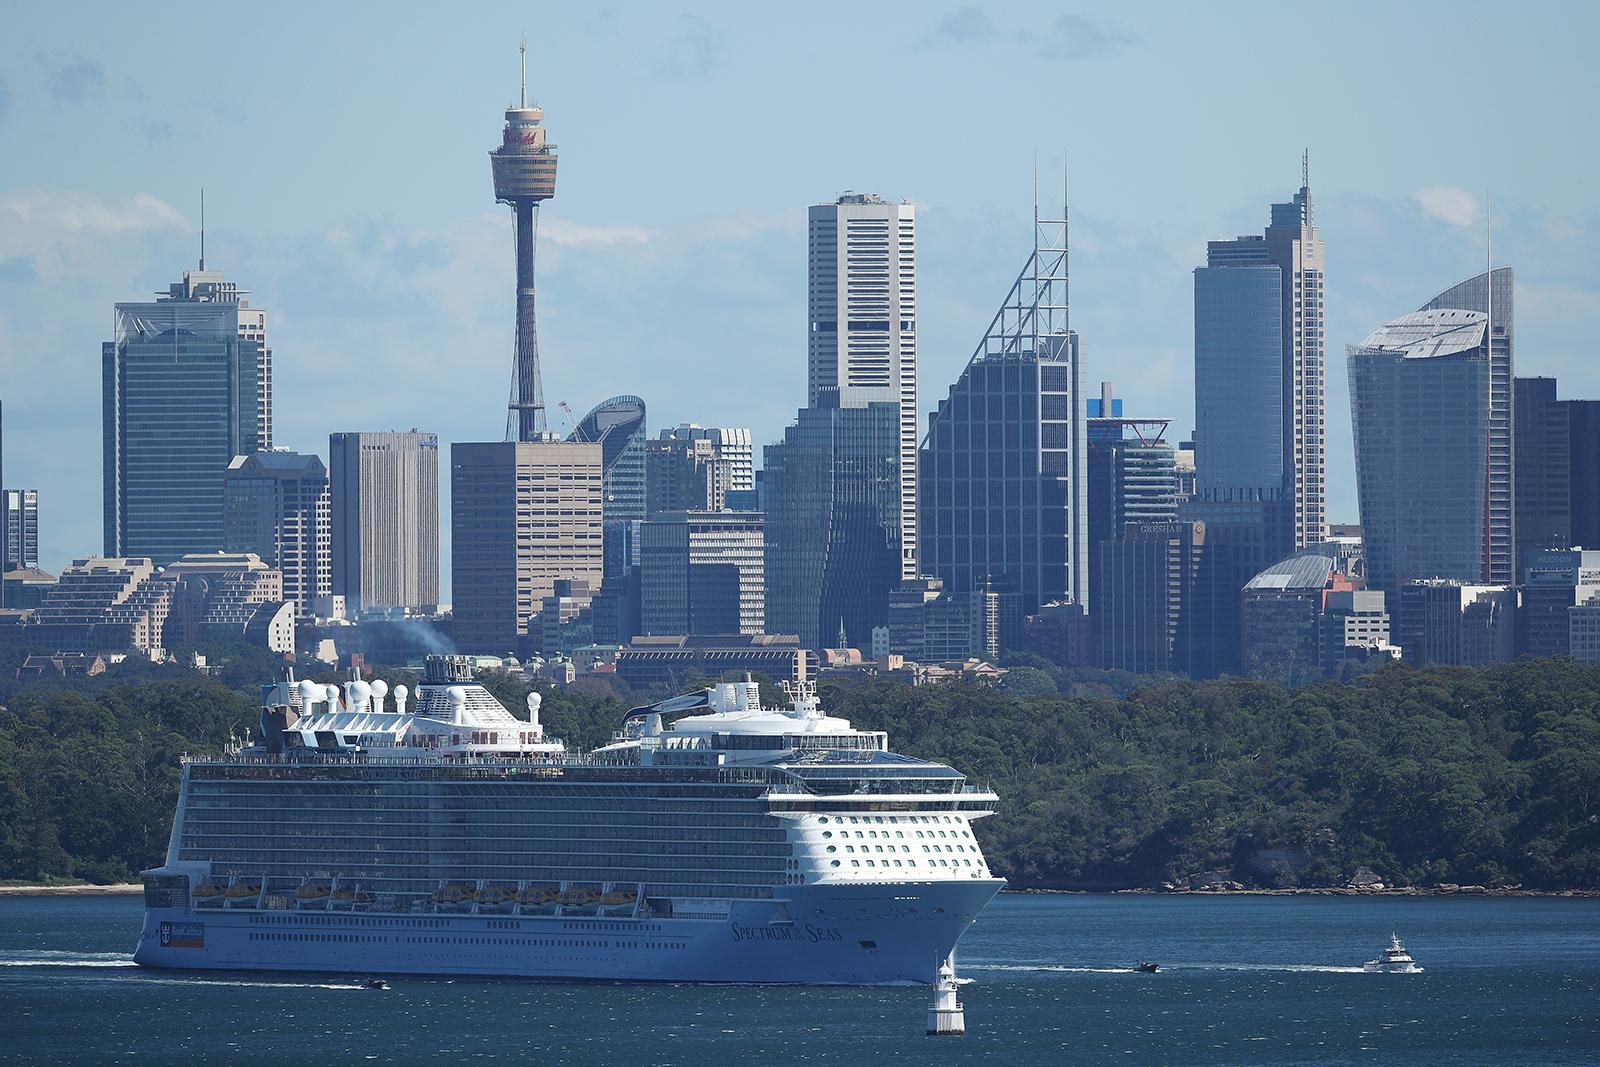 The Spectrum of the Seas cruise ship departs Sydney Harbor on April 4, in Sydney, Australia.